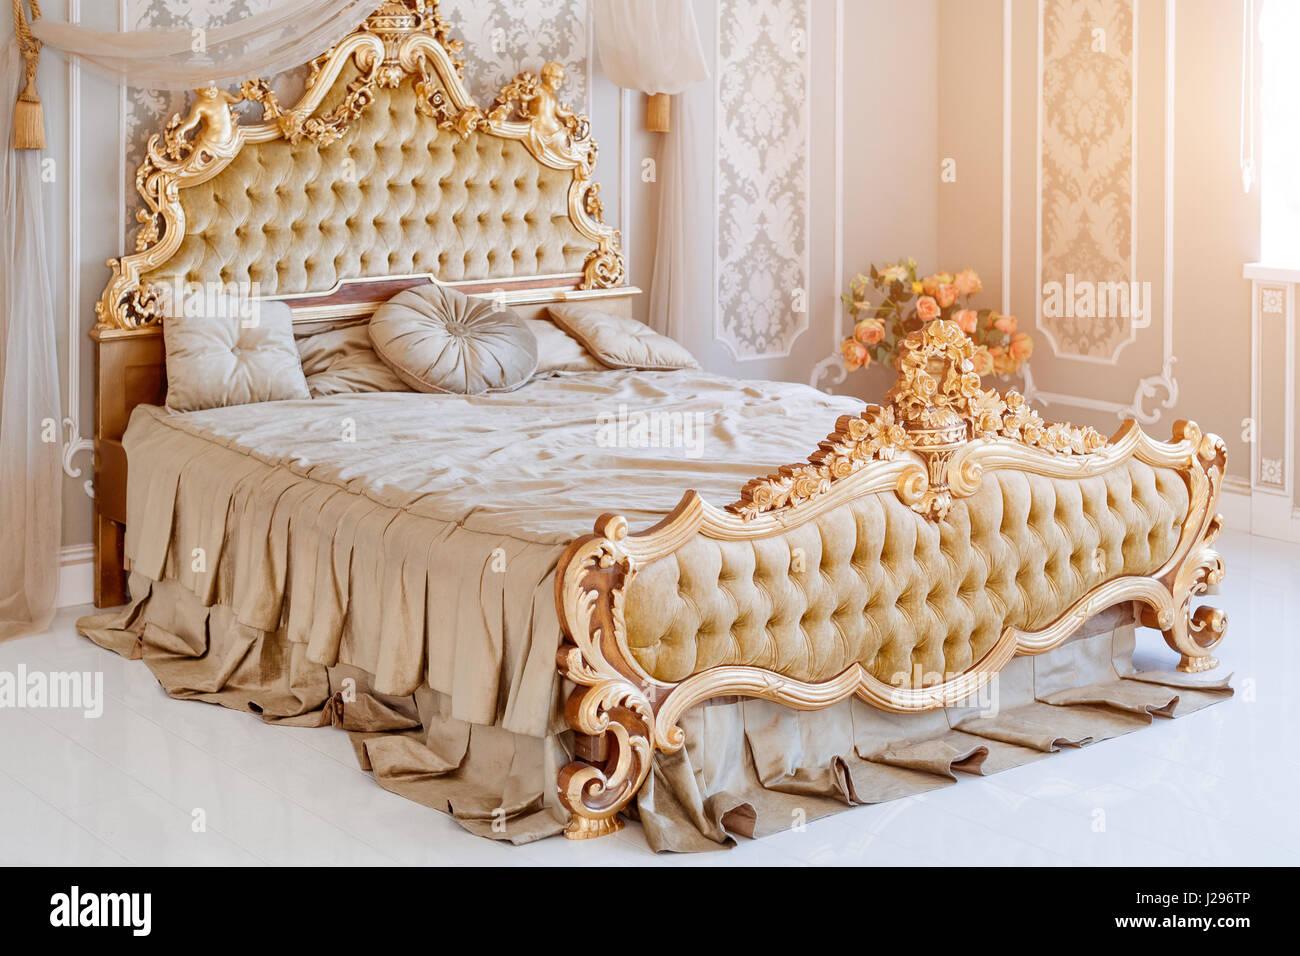 Luxury Bedroom In Light Colors With Golden Furniture Details Big